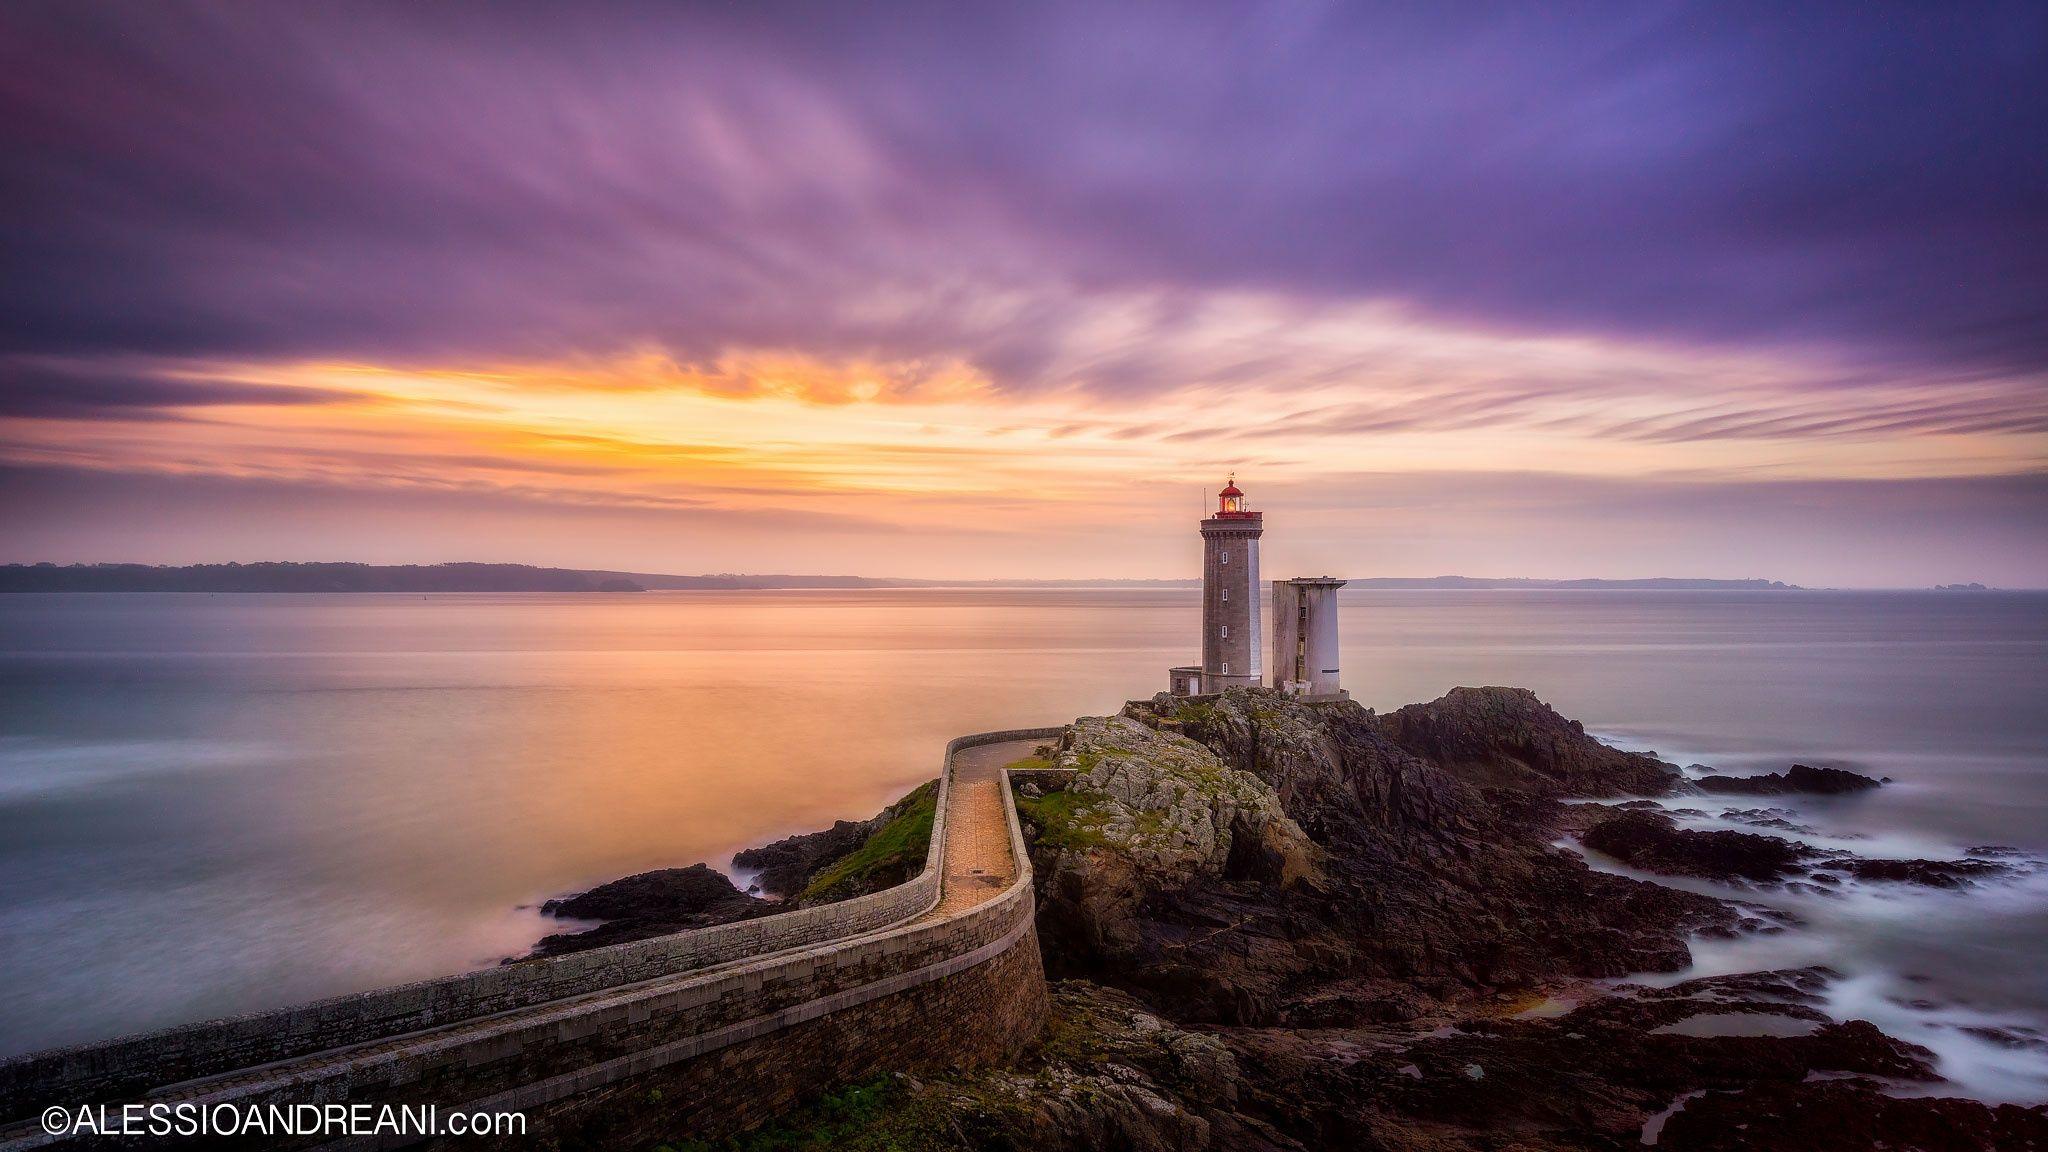 Phare Lighthouse Du Petit Minou In Brittany France A